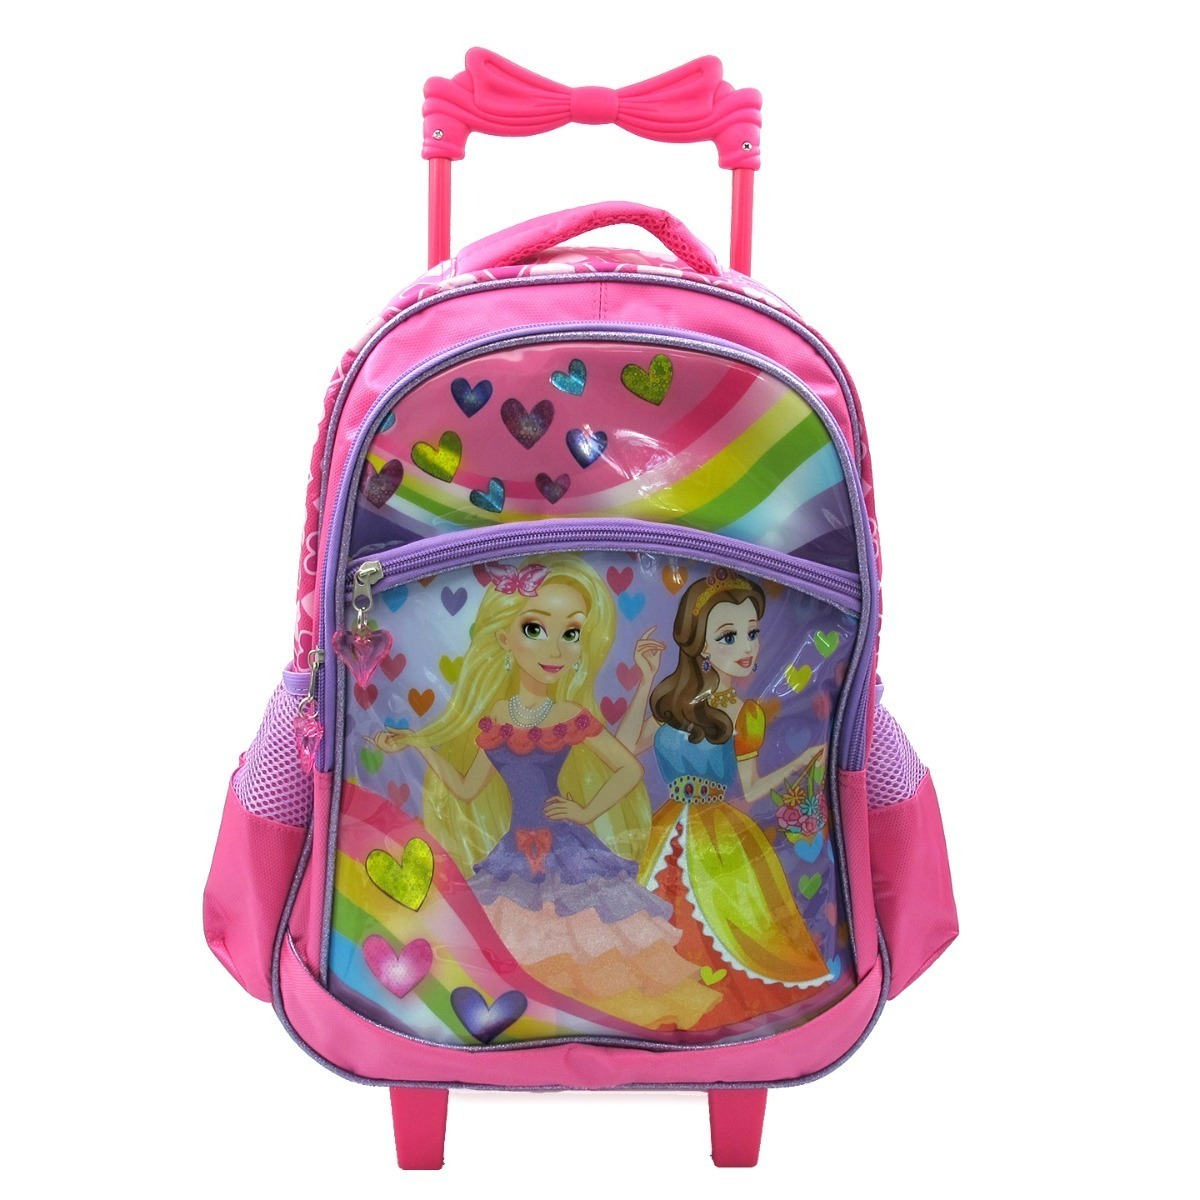 Bolsa Escolar Infantil Feminina Mercado Livre : Kit mochila escolar infantil feminina com rodinhas r